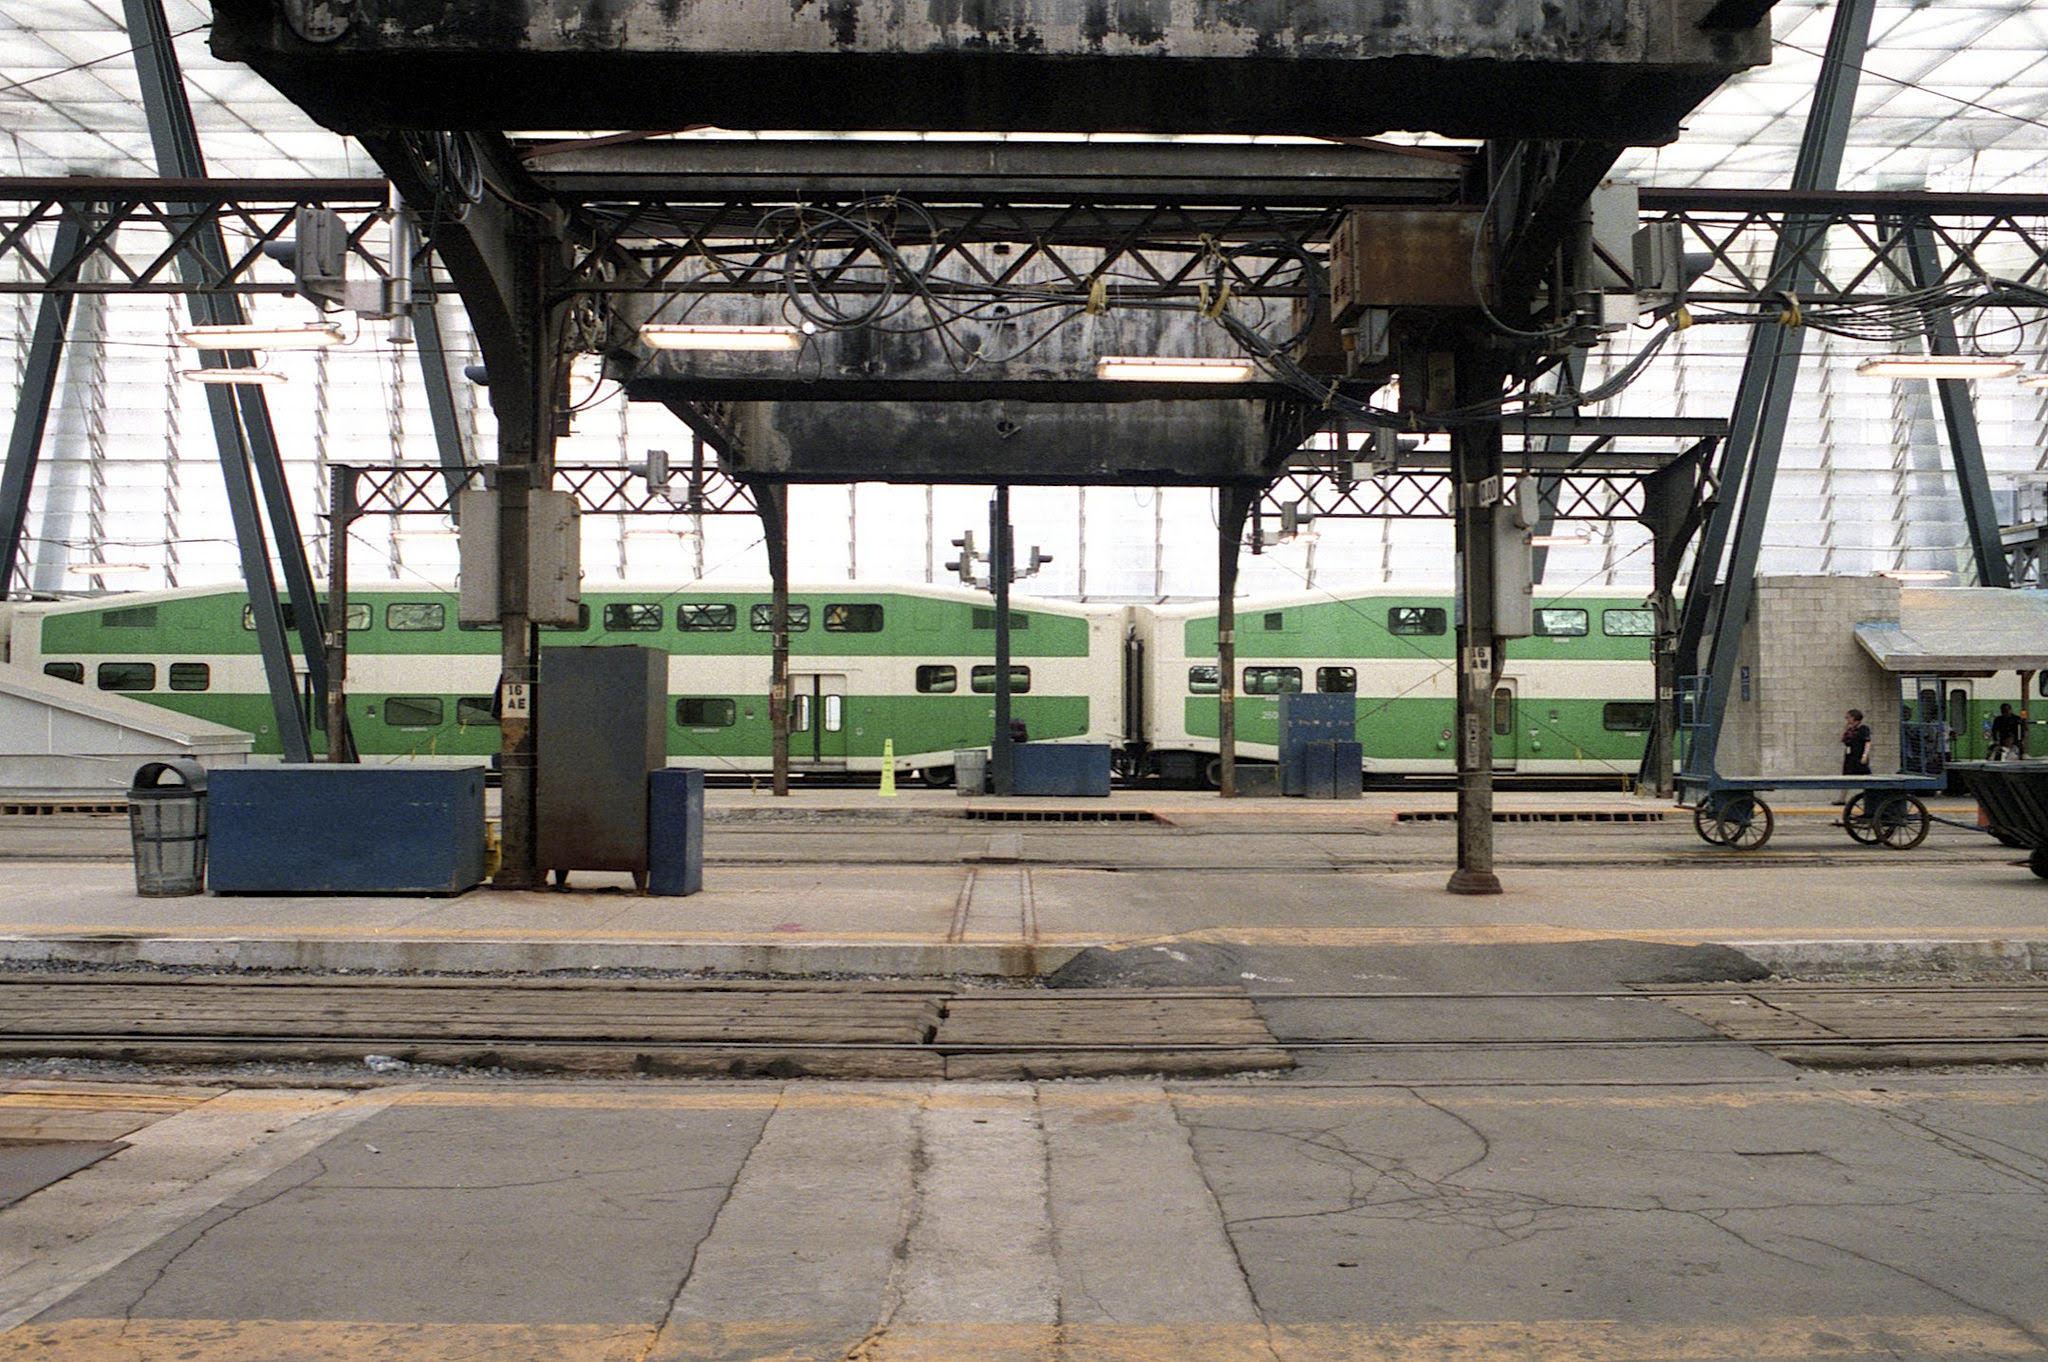 Track Level Toronto Union Station - Olympus OM-4 - Zuiko 28mm f/3.5 - Fuji Pro 400H